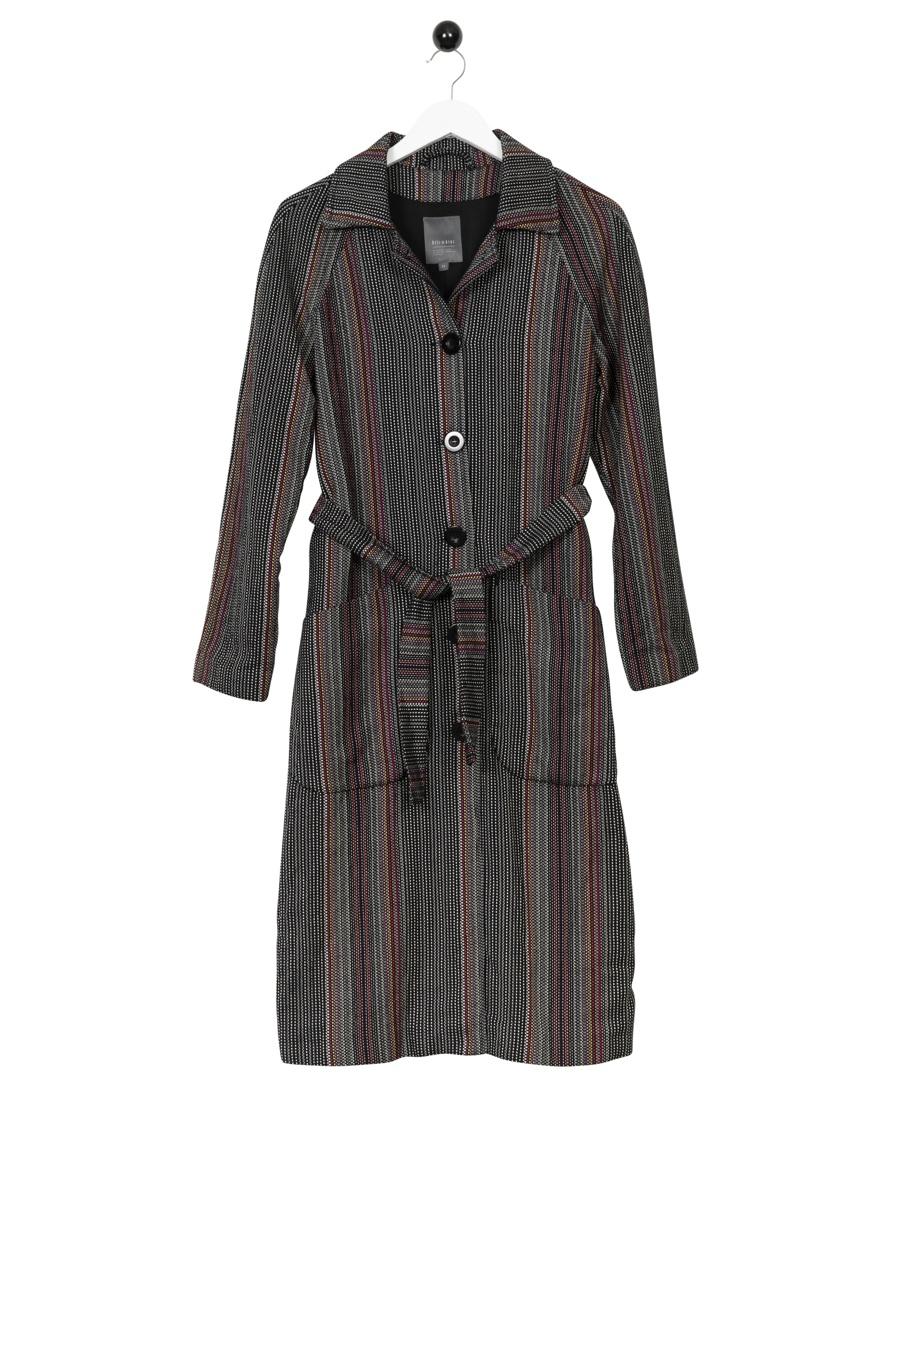 Grenoble Coat